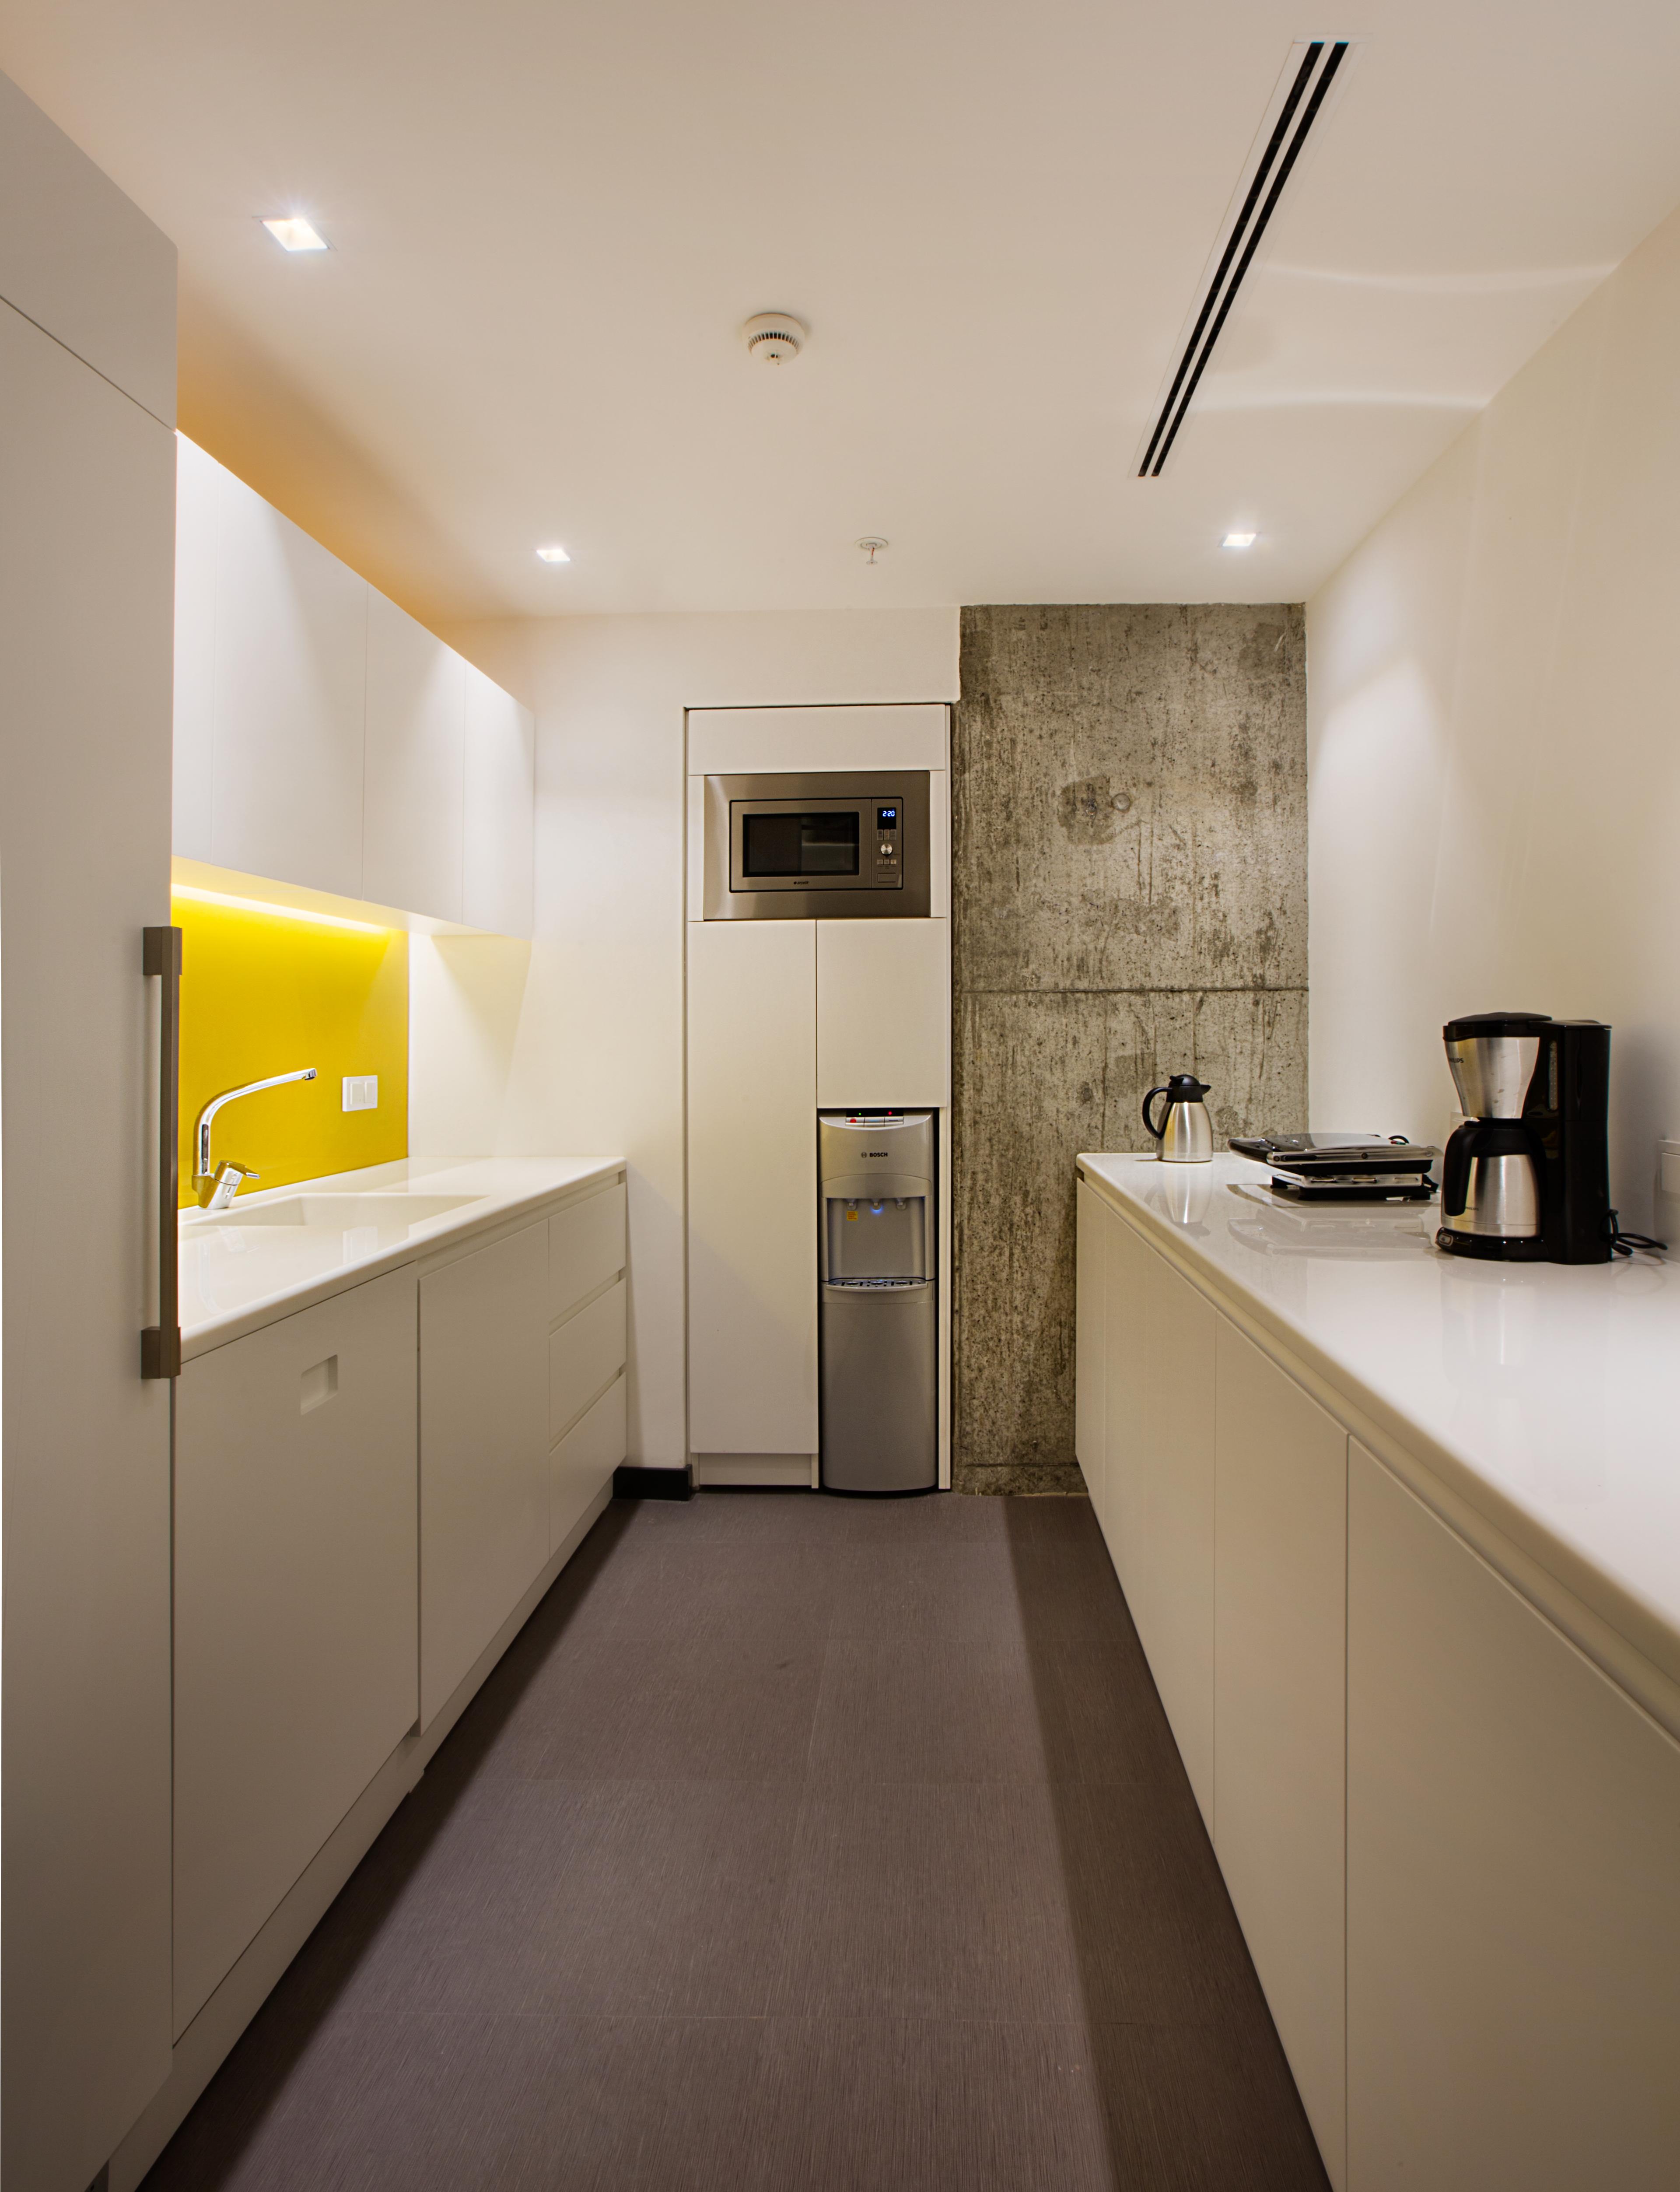 Avci+Architects-+INC+Research+Istanbul+Merkez+Ofisi-8